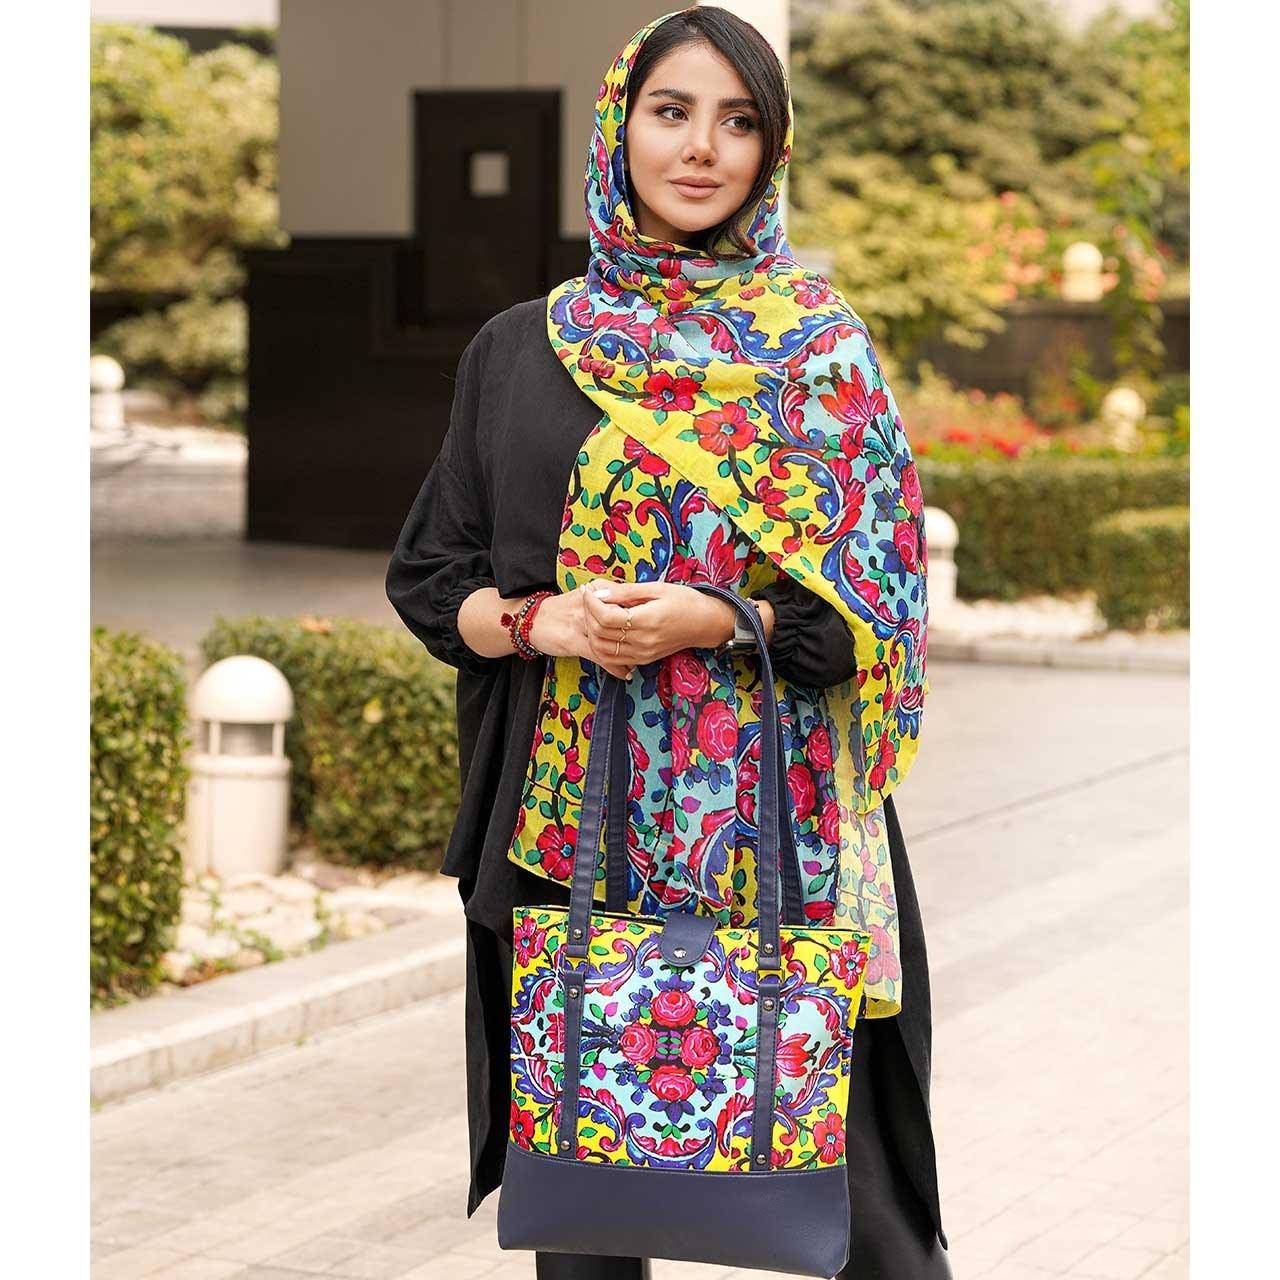 تصویر ست کیف و شال زنانه ارکیده کد 15 Orkideh Women  Bag  and  Shawl  Set Code 15